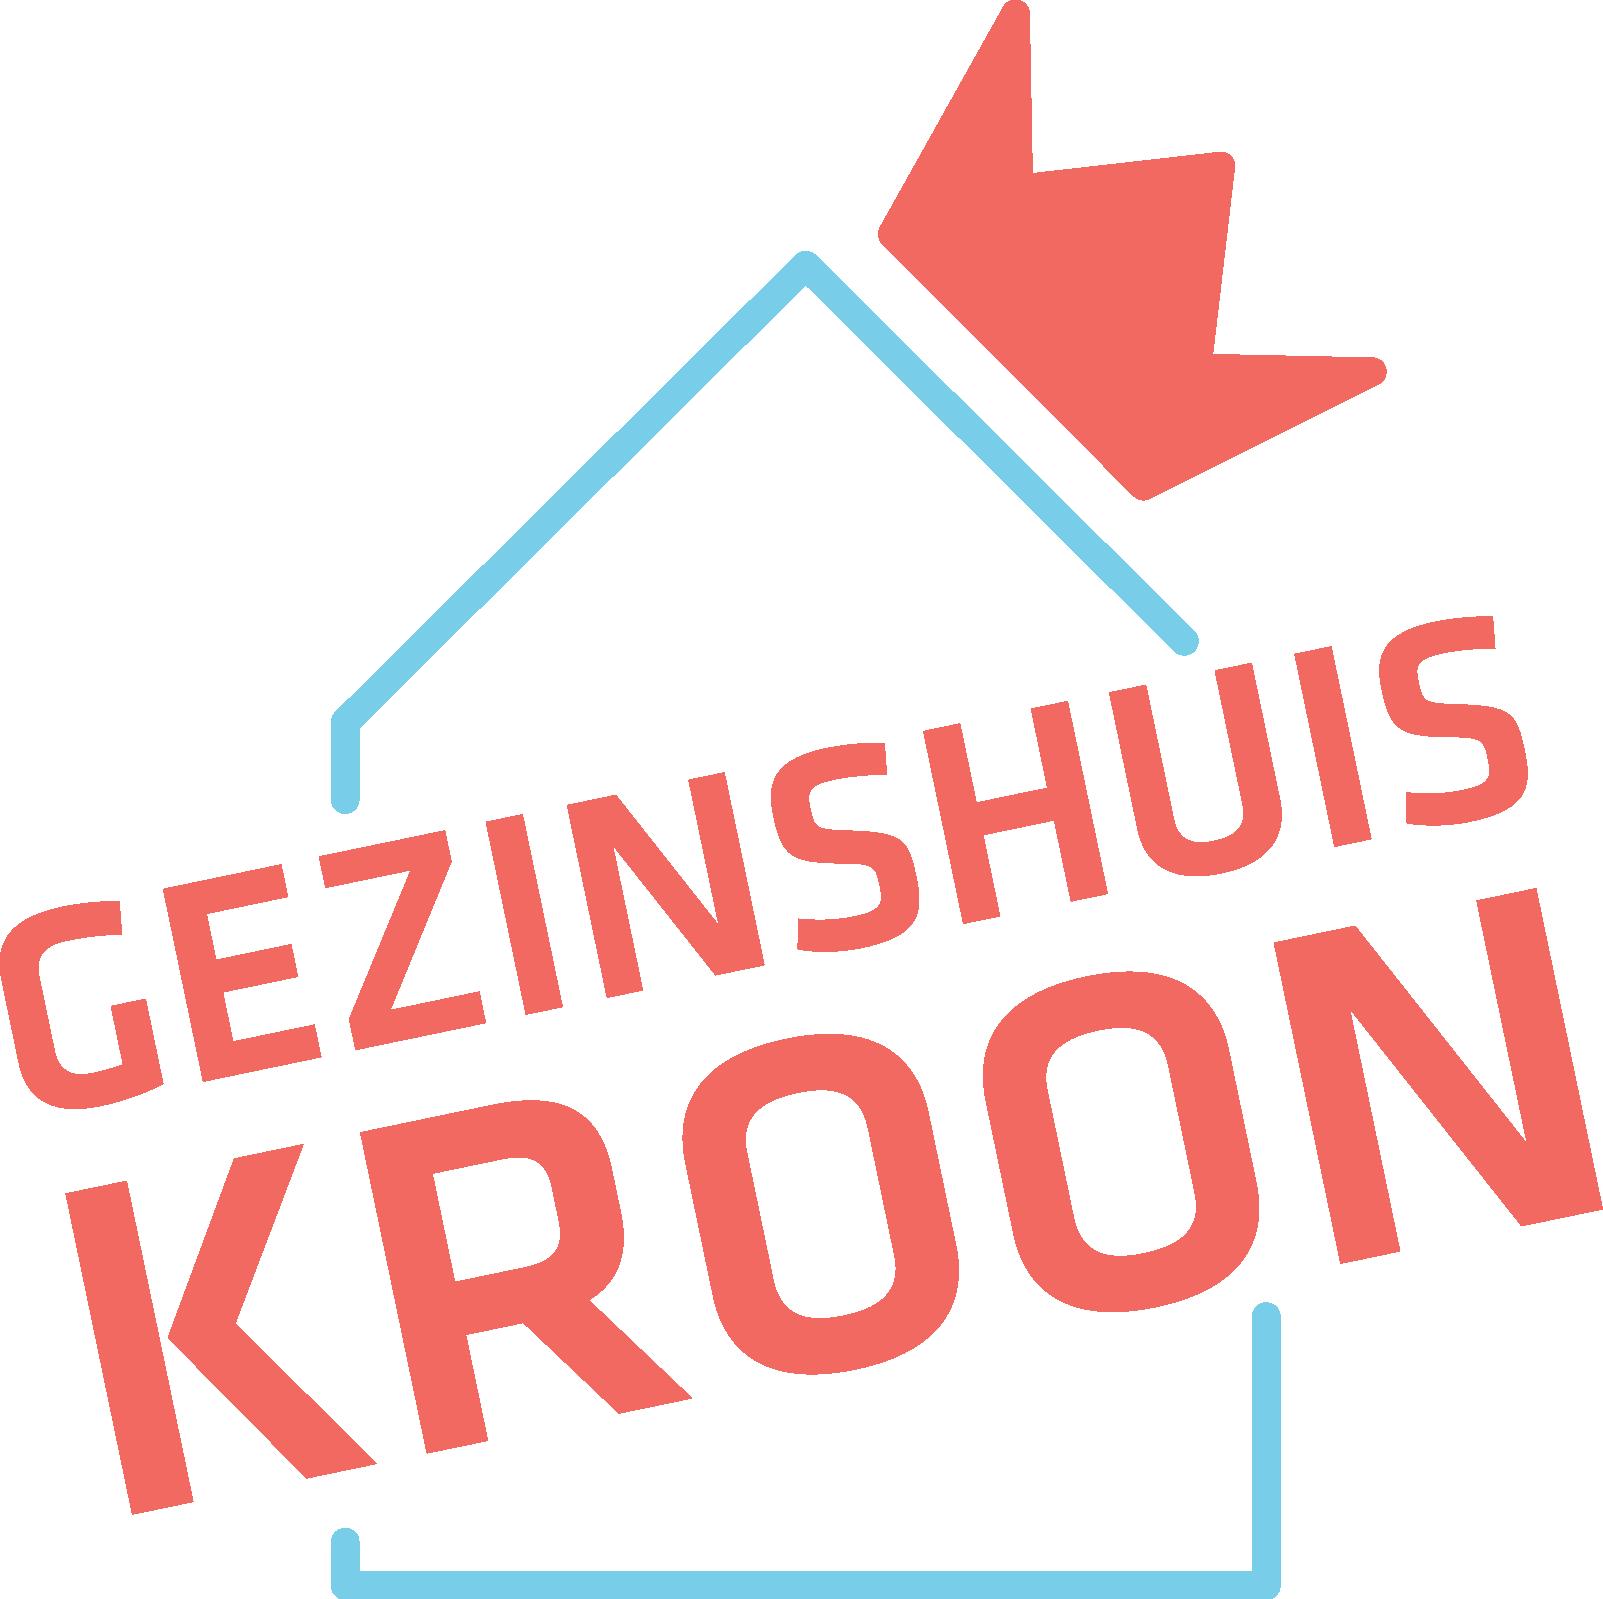 Gezinshuis Kroon